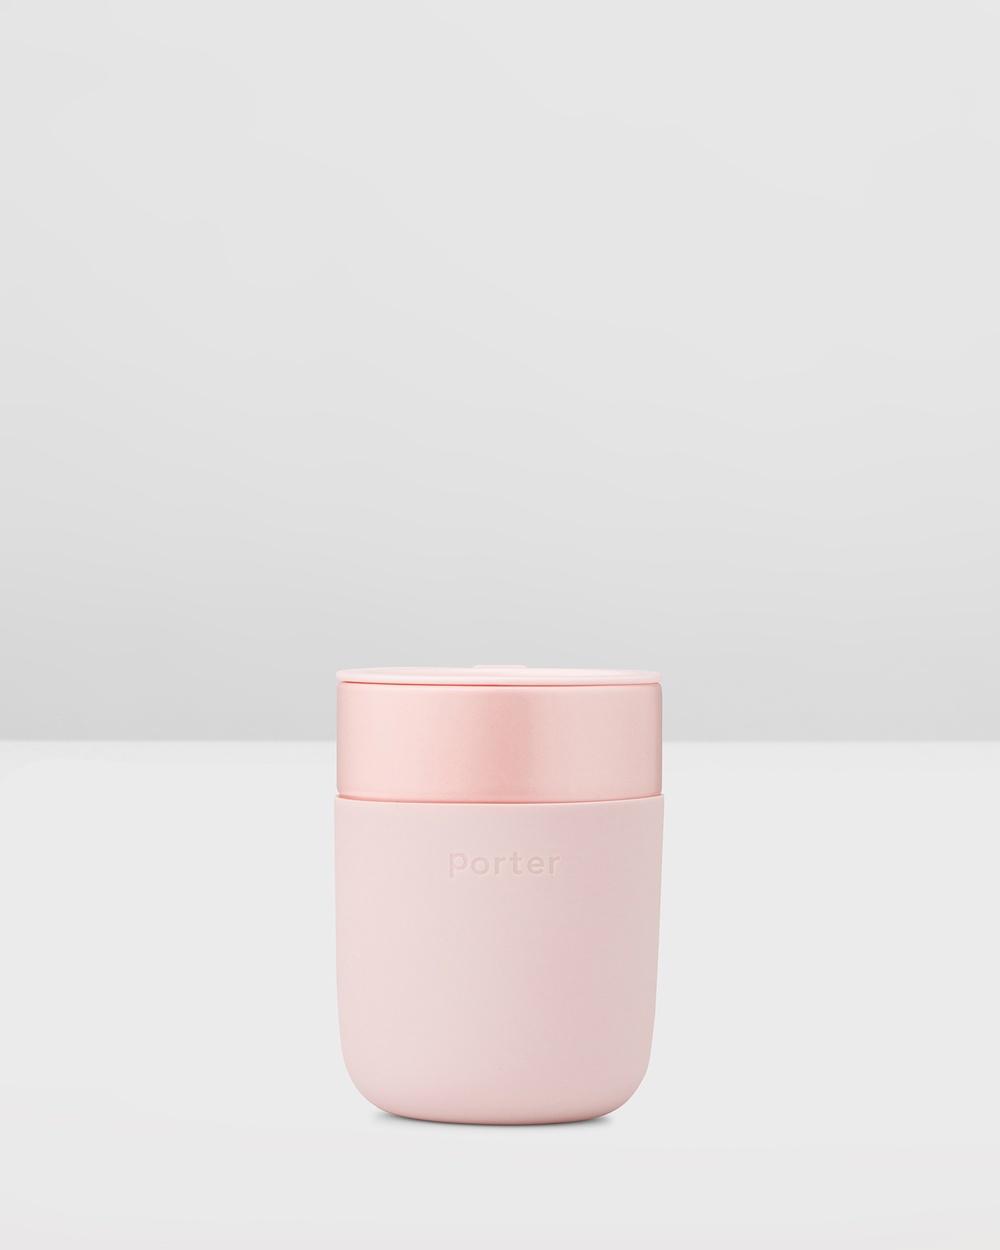 Porter Ceramic Mug 355ml Accessories Pink